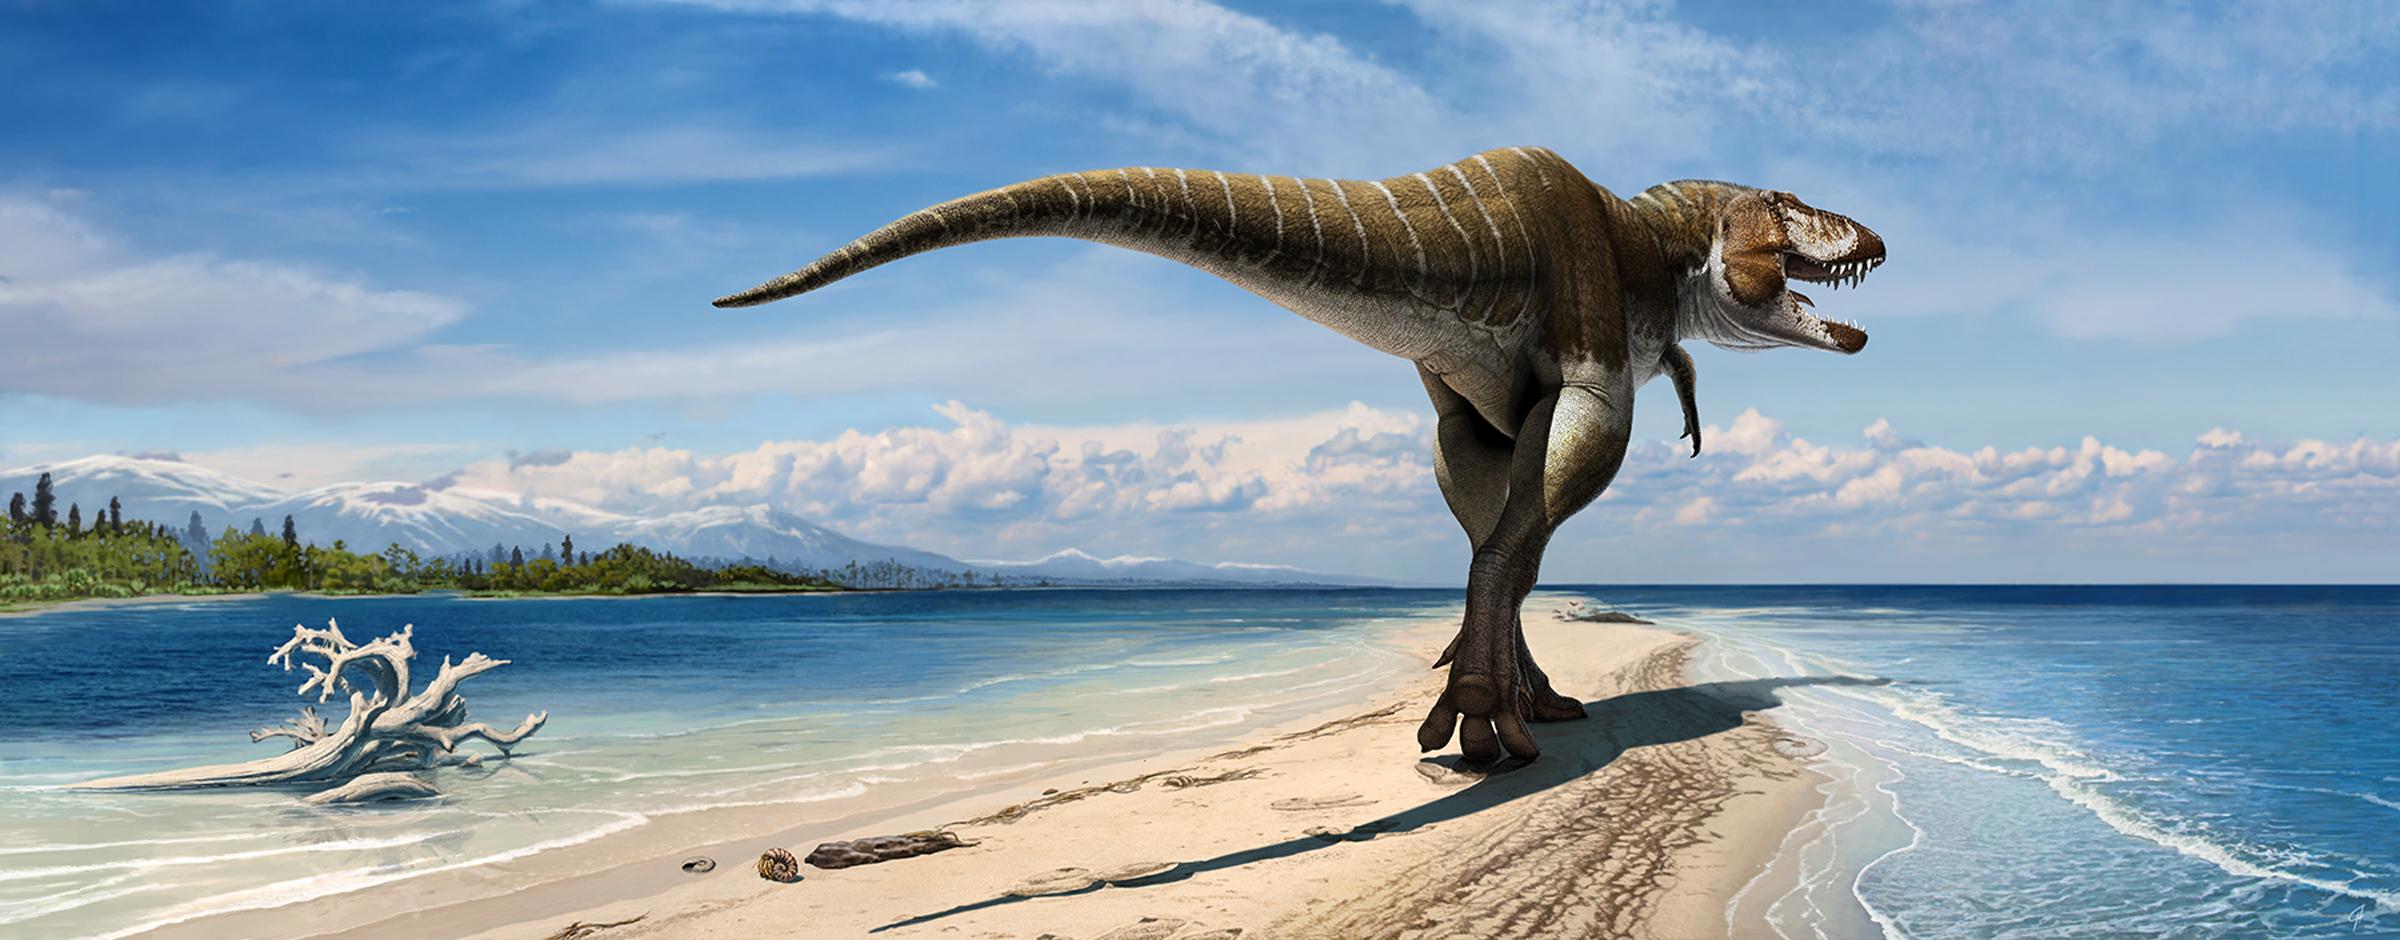 Wahweap coastline tyrannosaur.